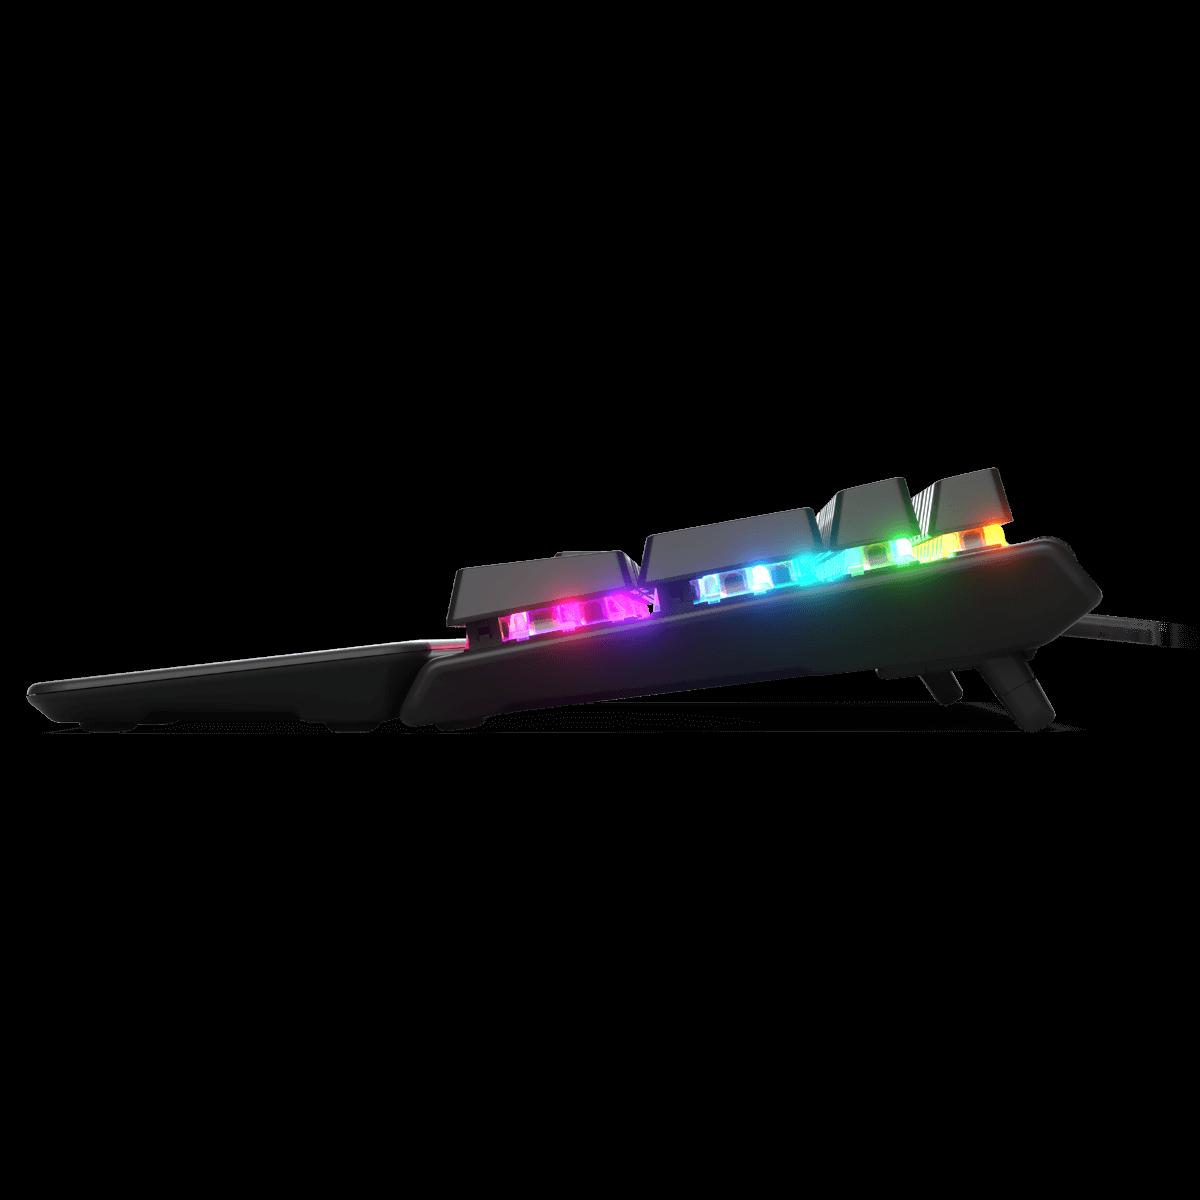 SteelSeries Apex Pro 機械式電競鍵盤 - TW